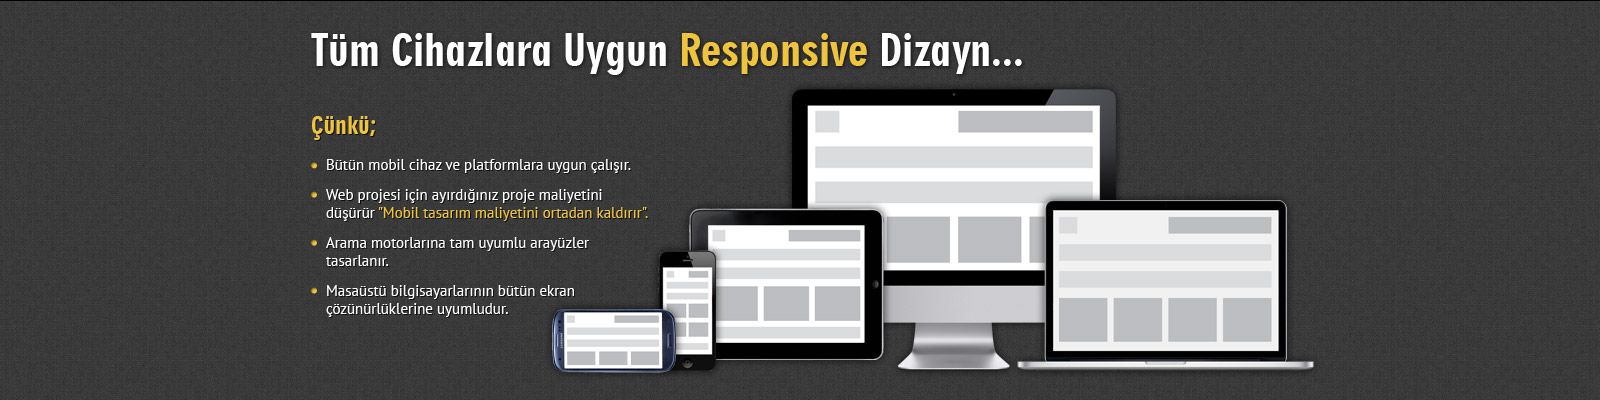 Responsive Dizayn